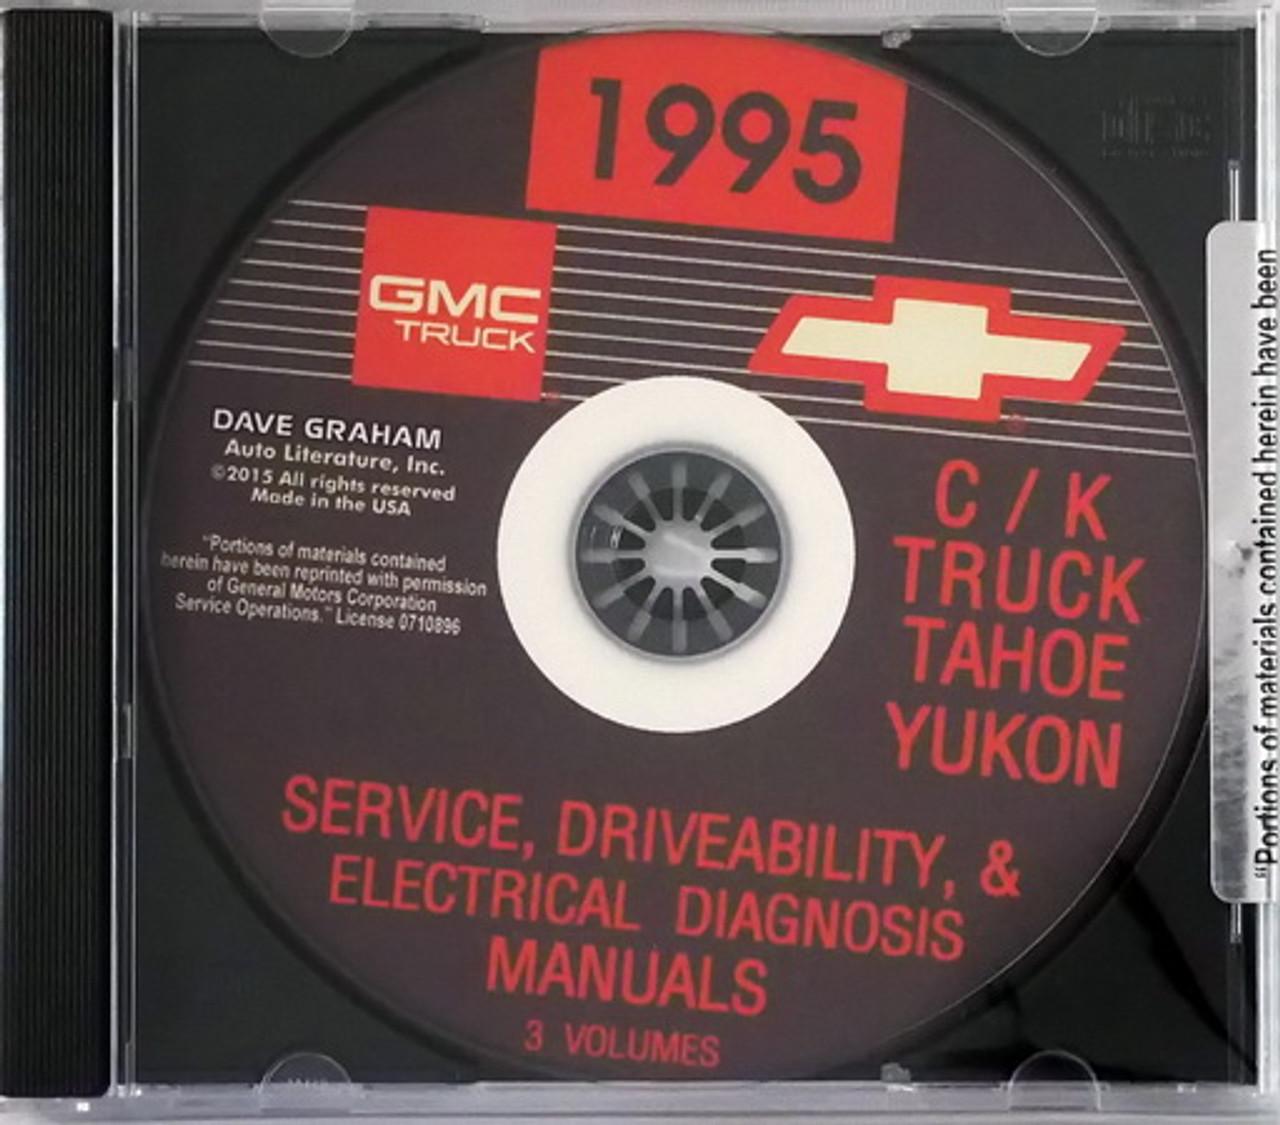 1997 CHEVY TAHOE CK C//K TRUCK A//C Service Shop Repair Manual SUPPLEMENT